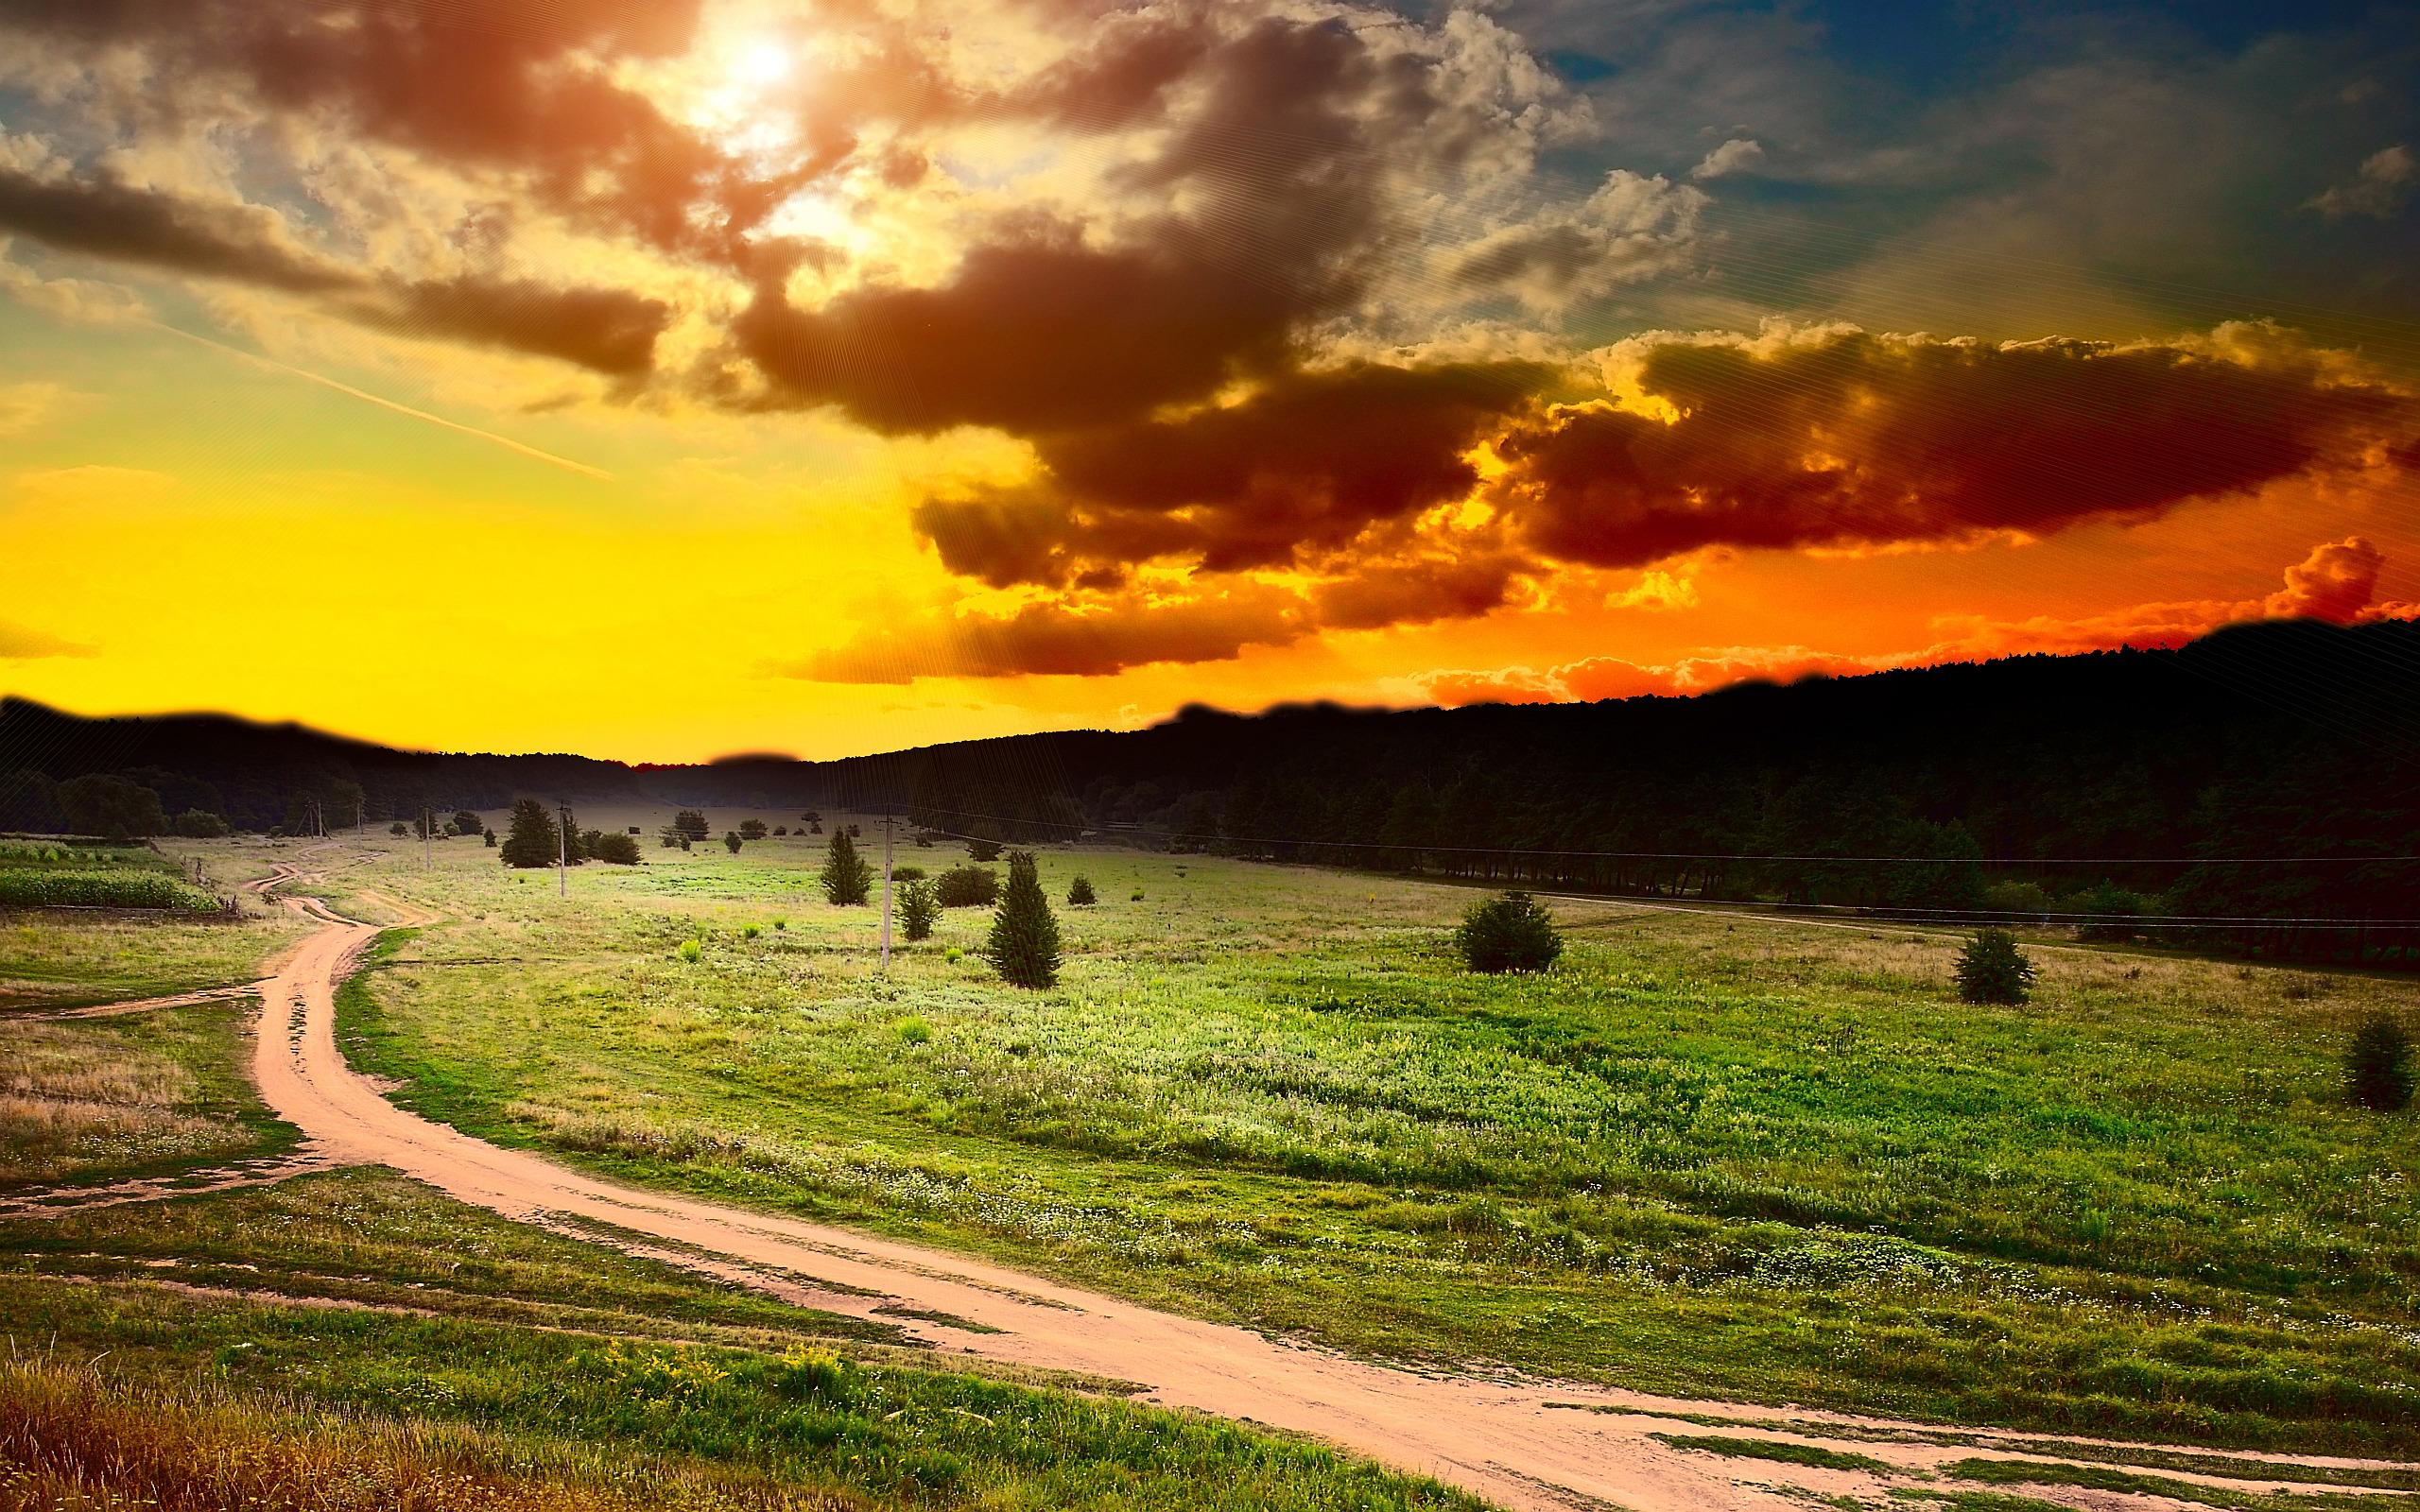 Sunset Pictures Landscape  Hd Desktop Wallpapers  4k Hd